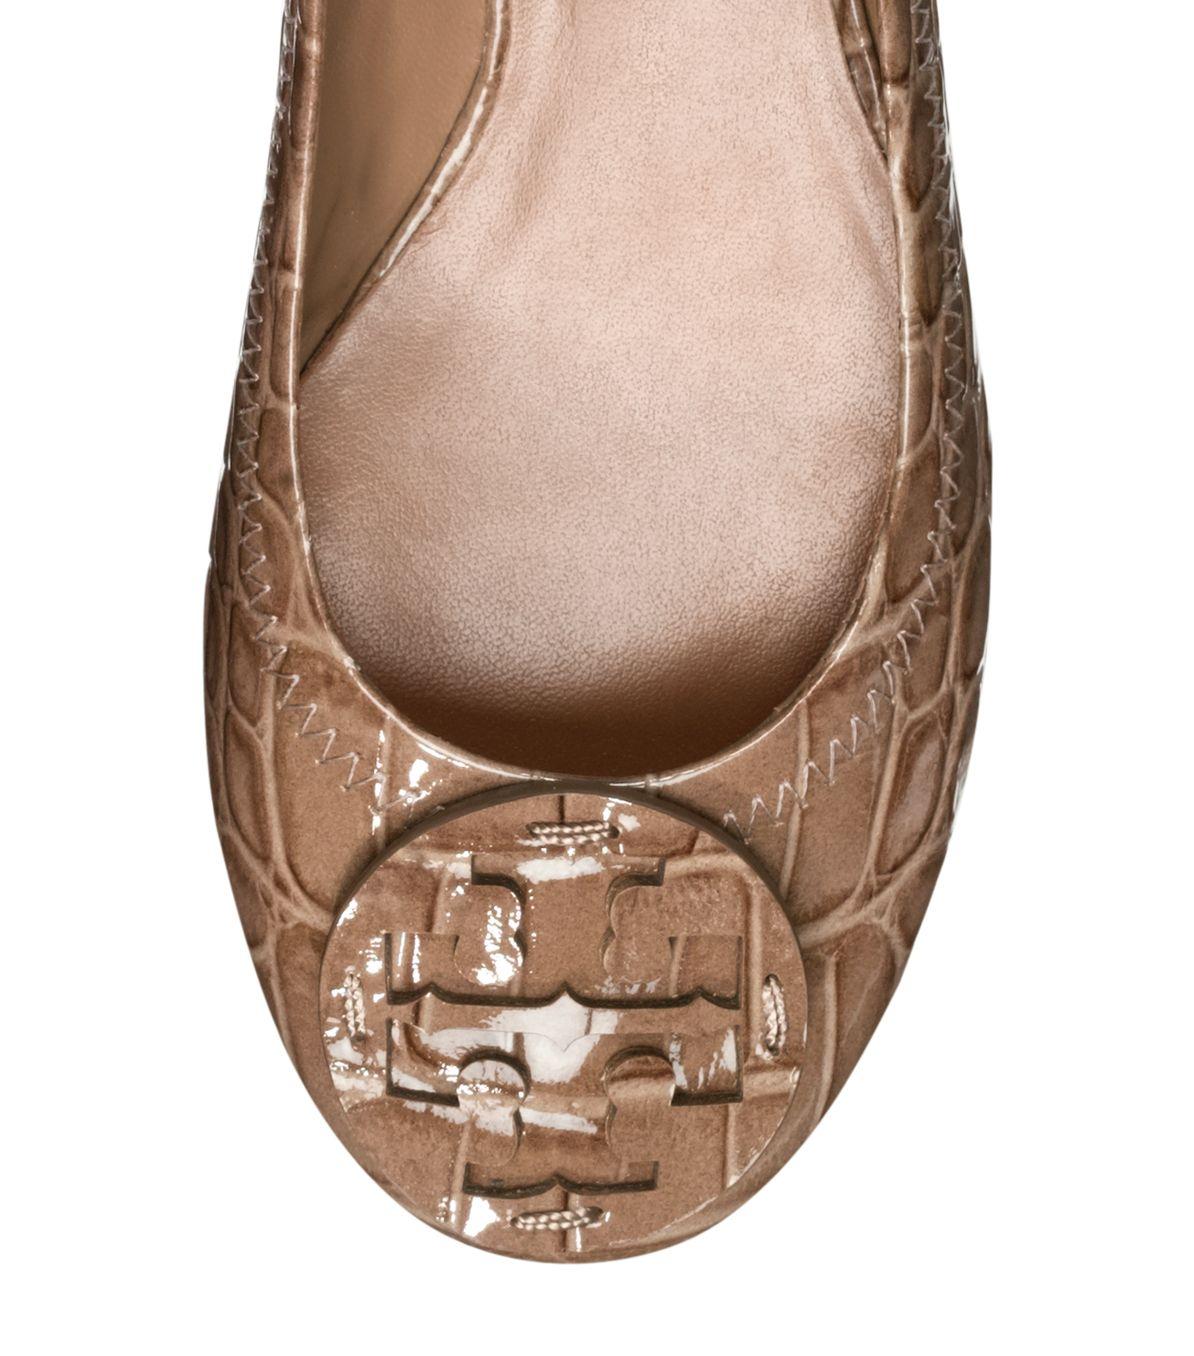 8846f252acc9 Lyst - Tory Burch Croc Printed Reva Ballet Flat in Brown